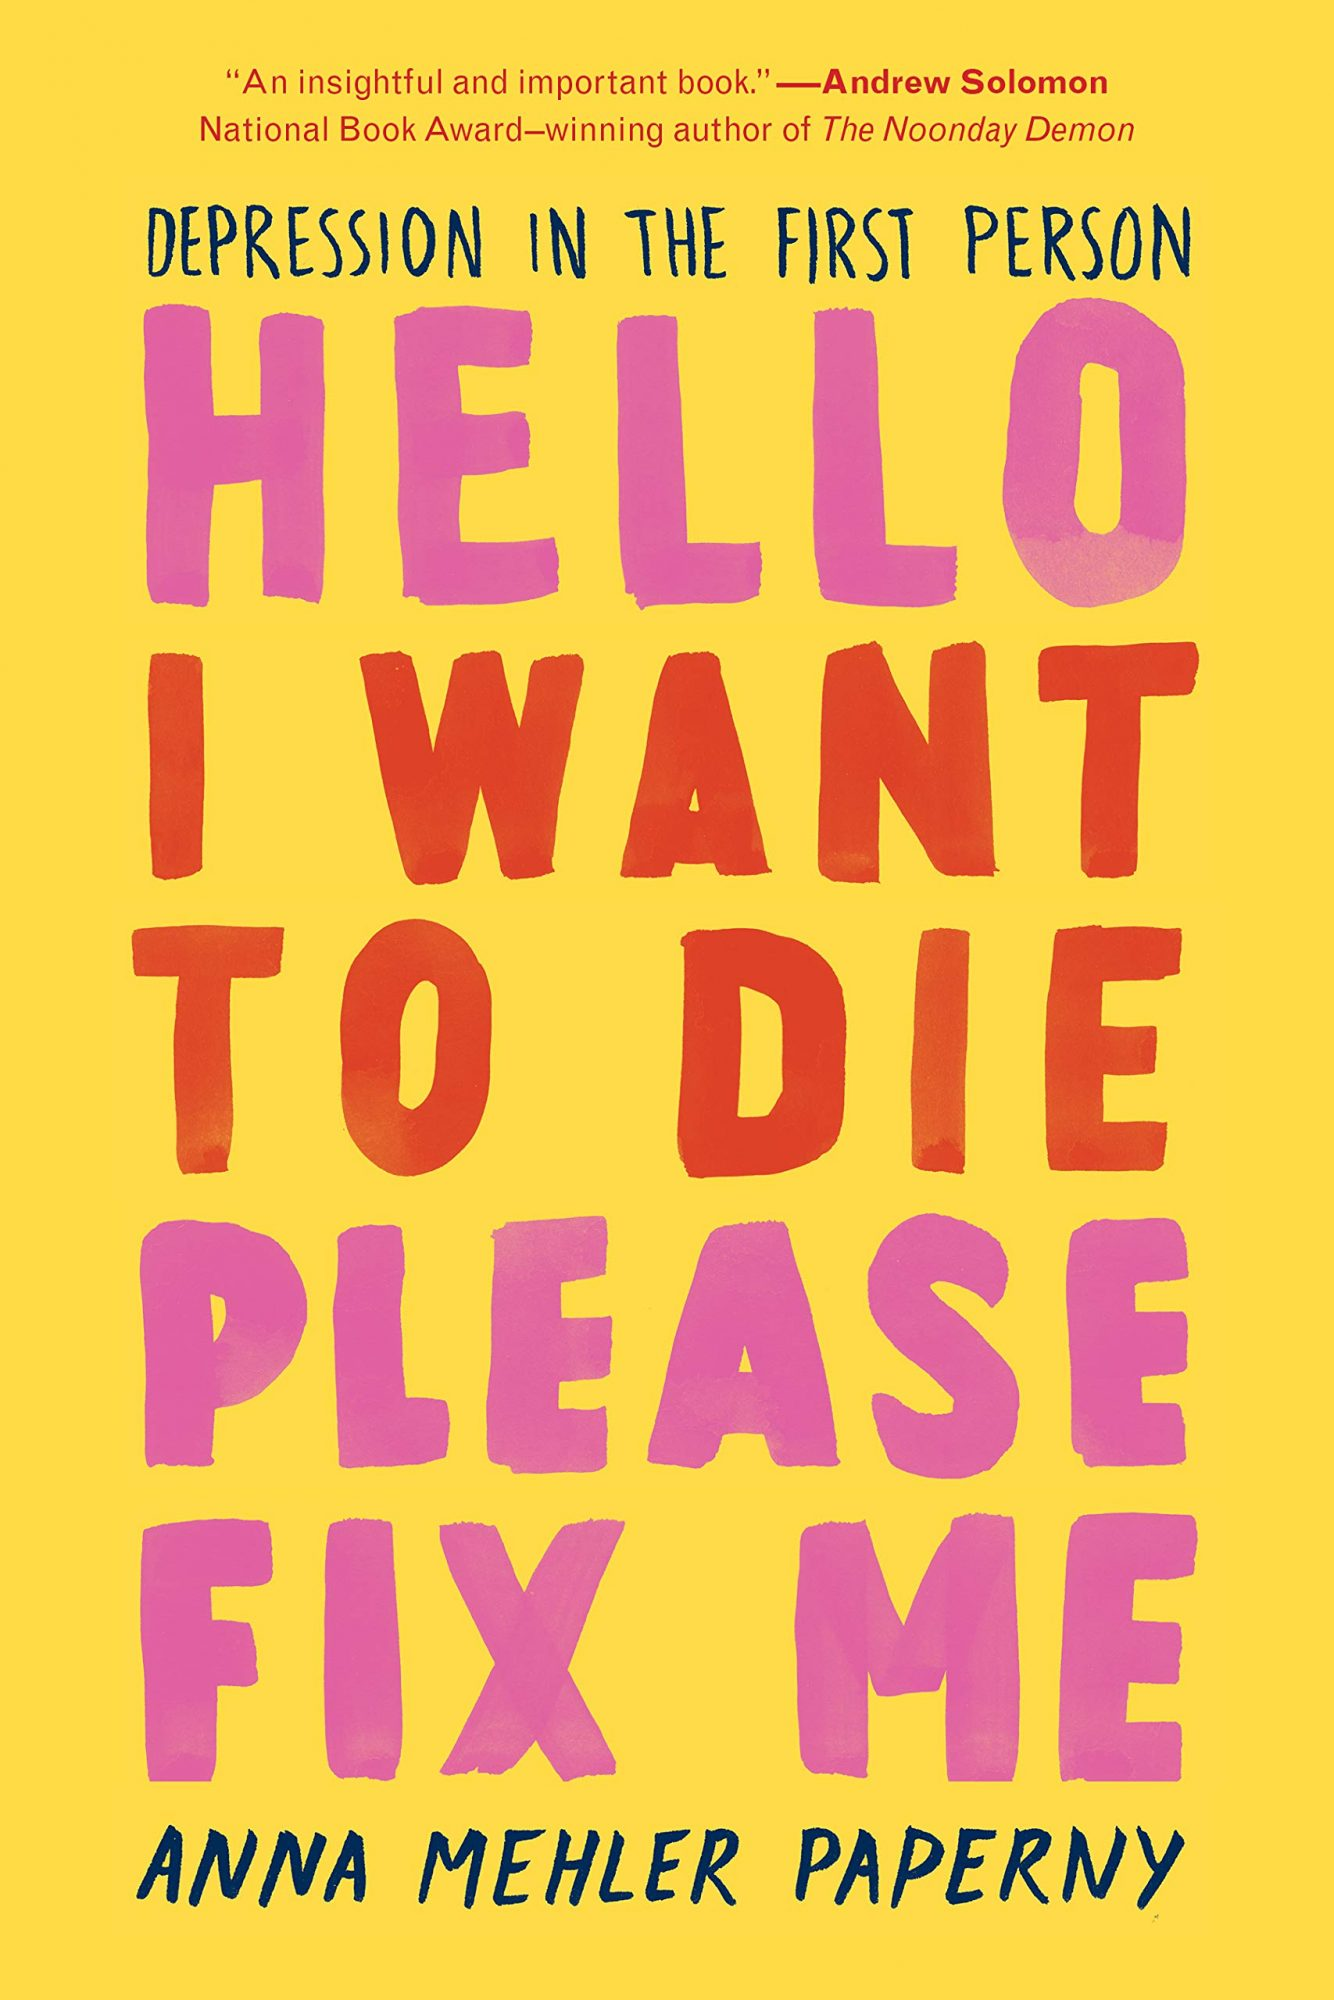 hello-I-want-to-die-please-fix-me.jpg